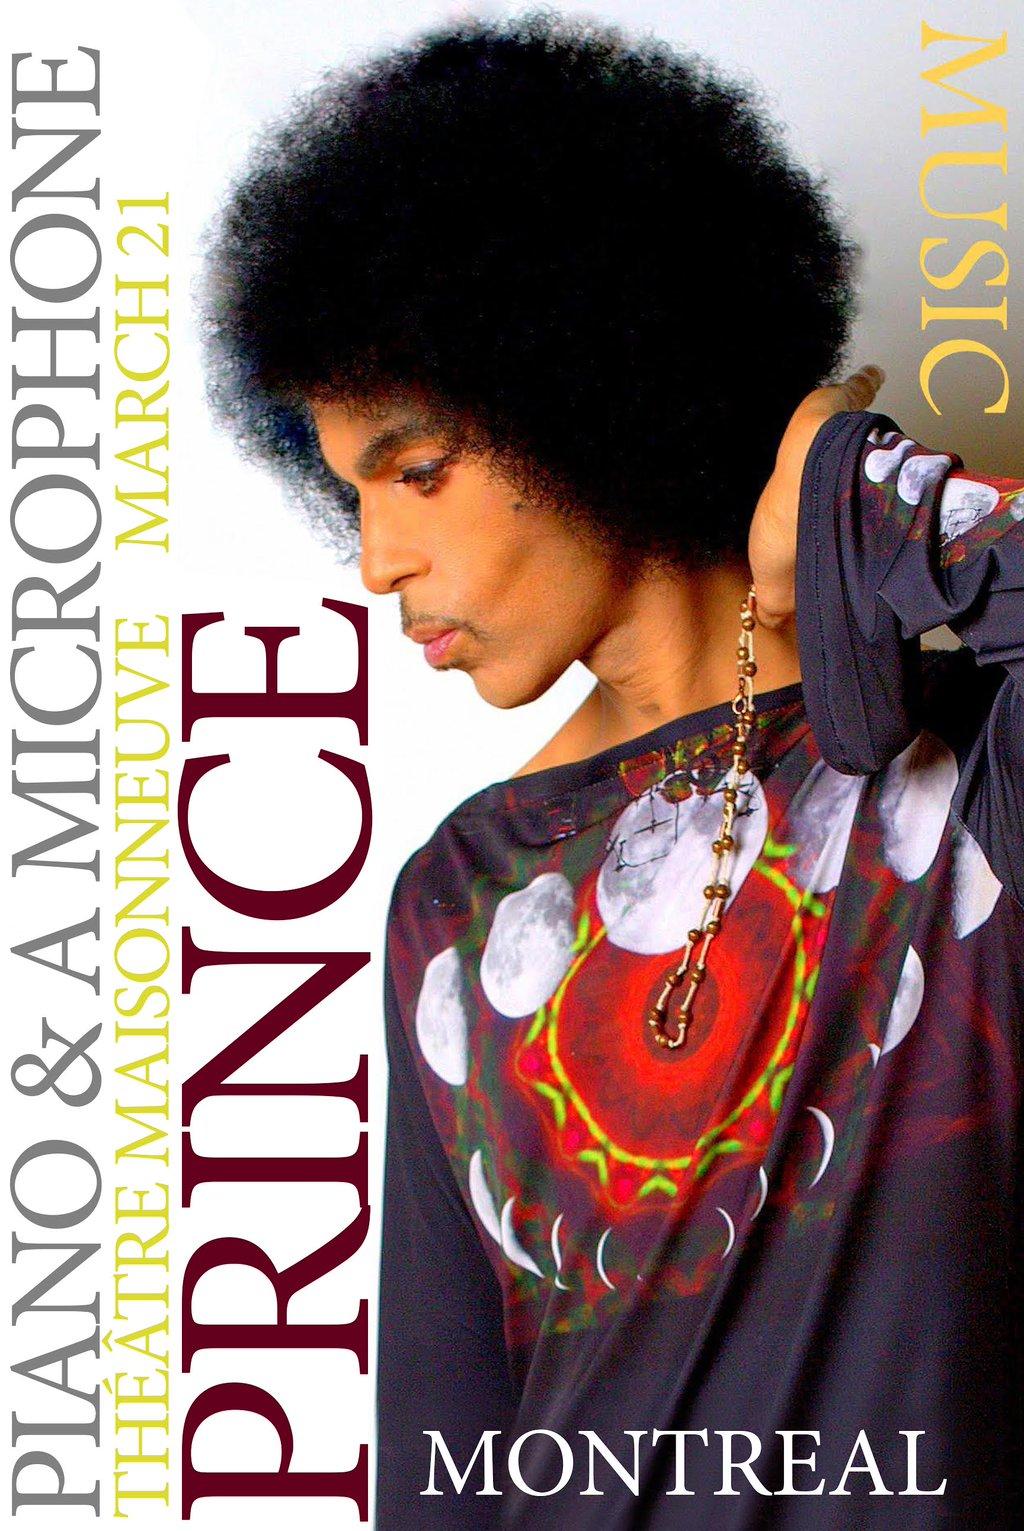 2016 Prince Concert Tour Prince News Funkatopia